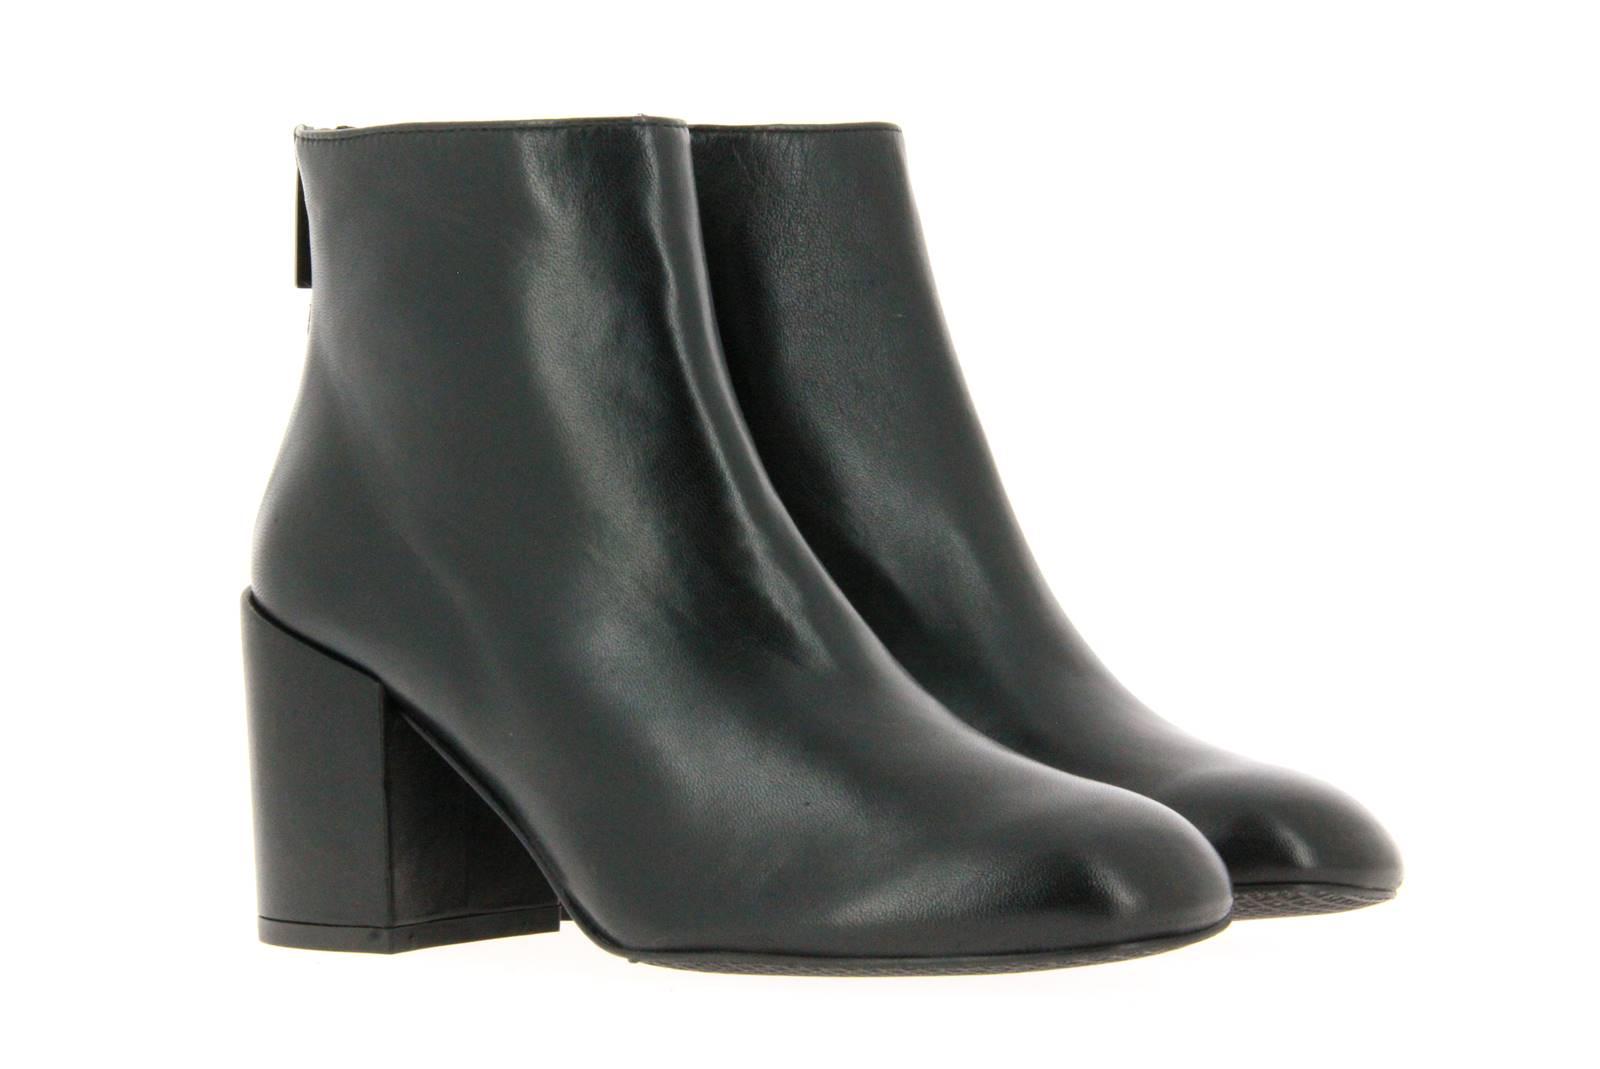 Stuart Weitzman ankle boots BACARI NAPPA BLACK